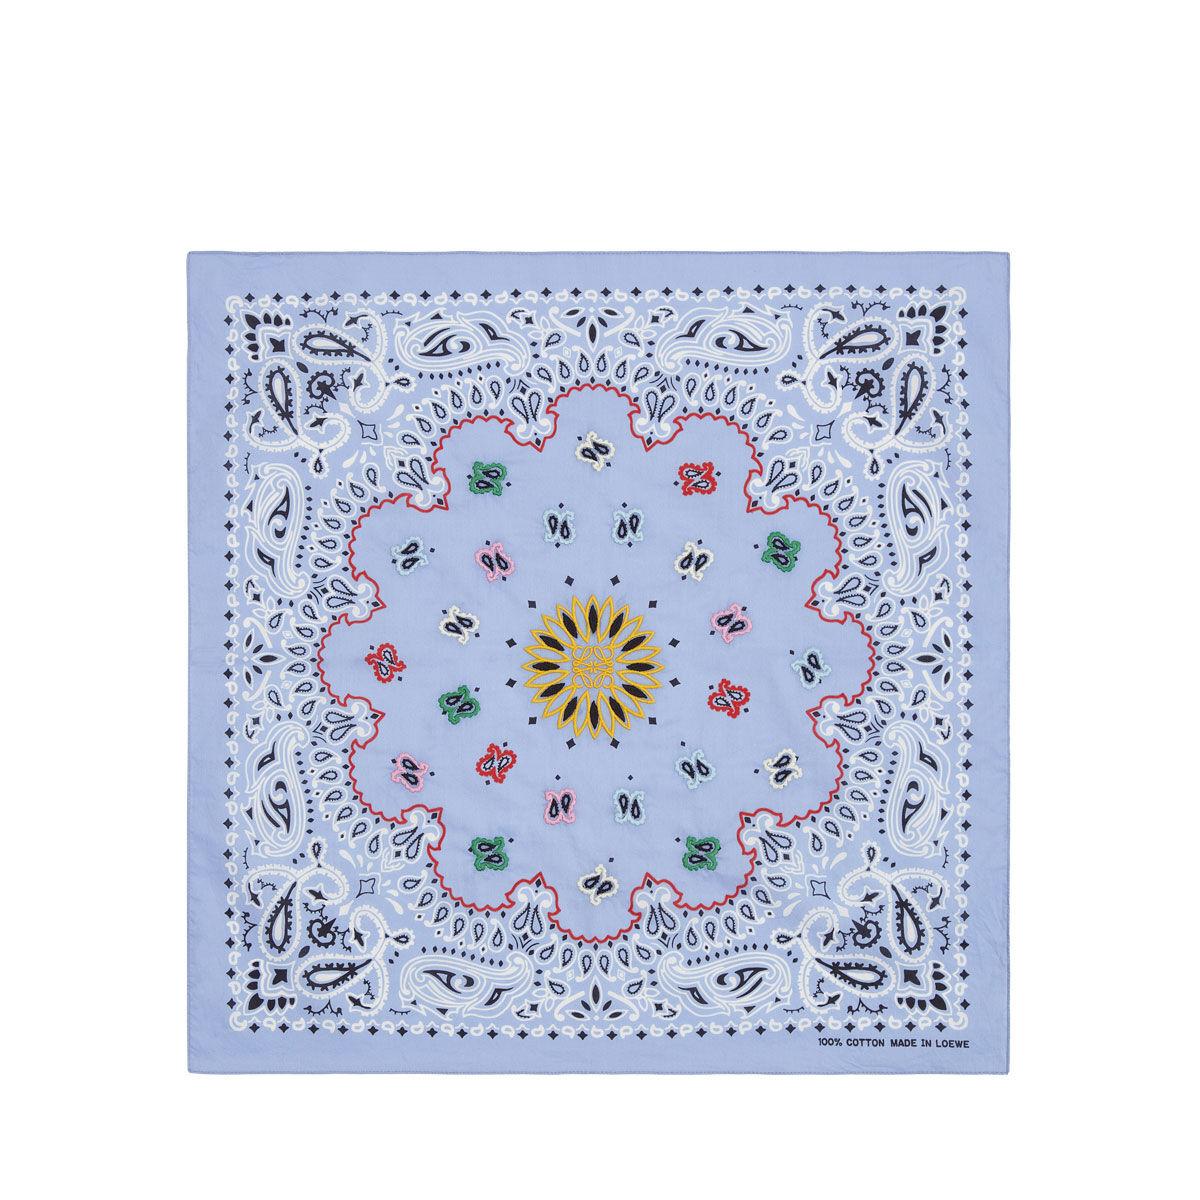 LOEWE 50X50 Bandana Embroideries Azul all